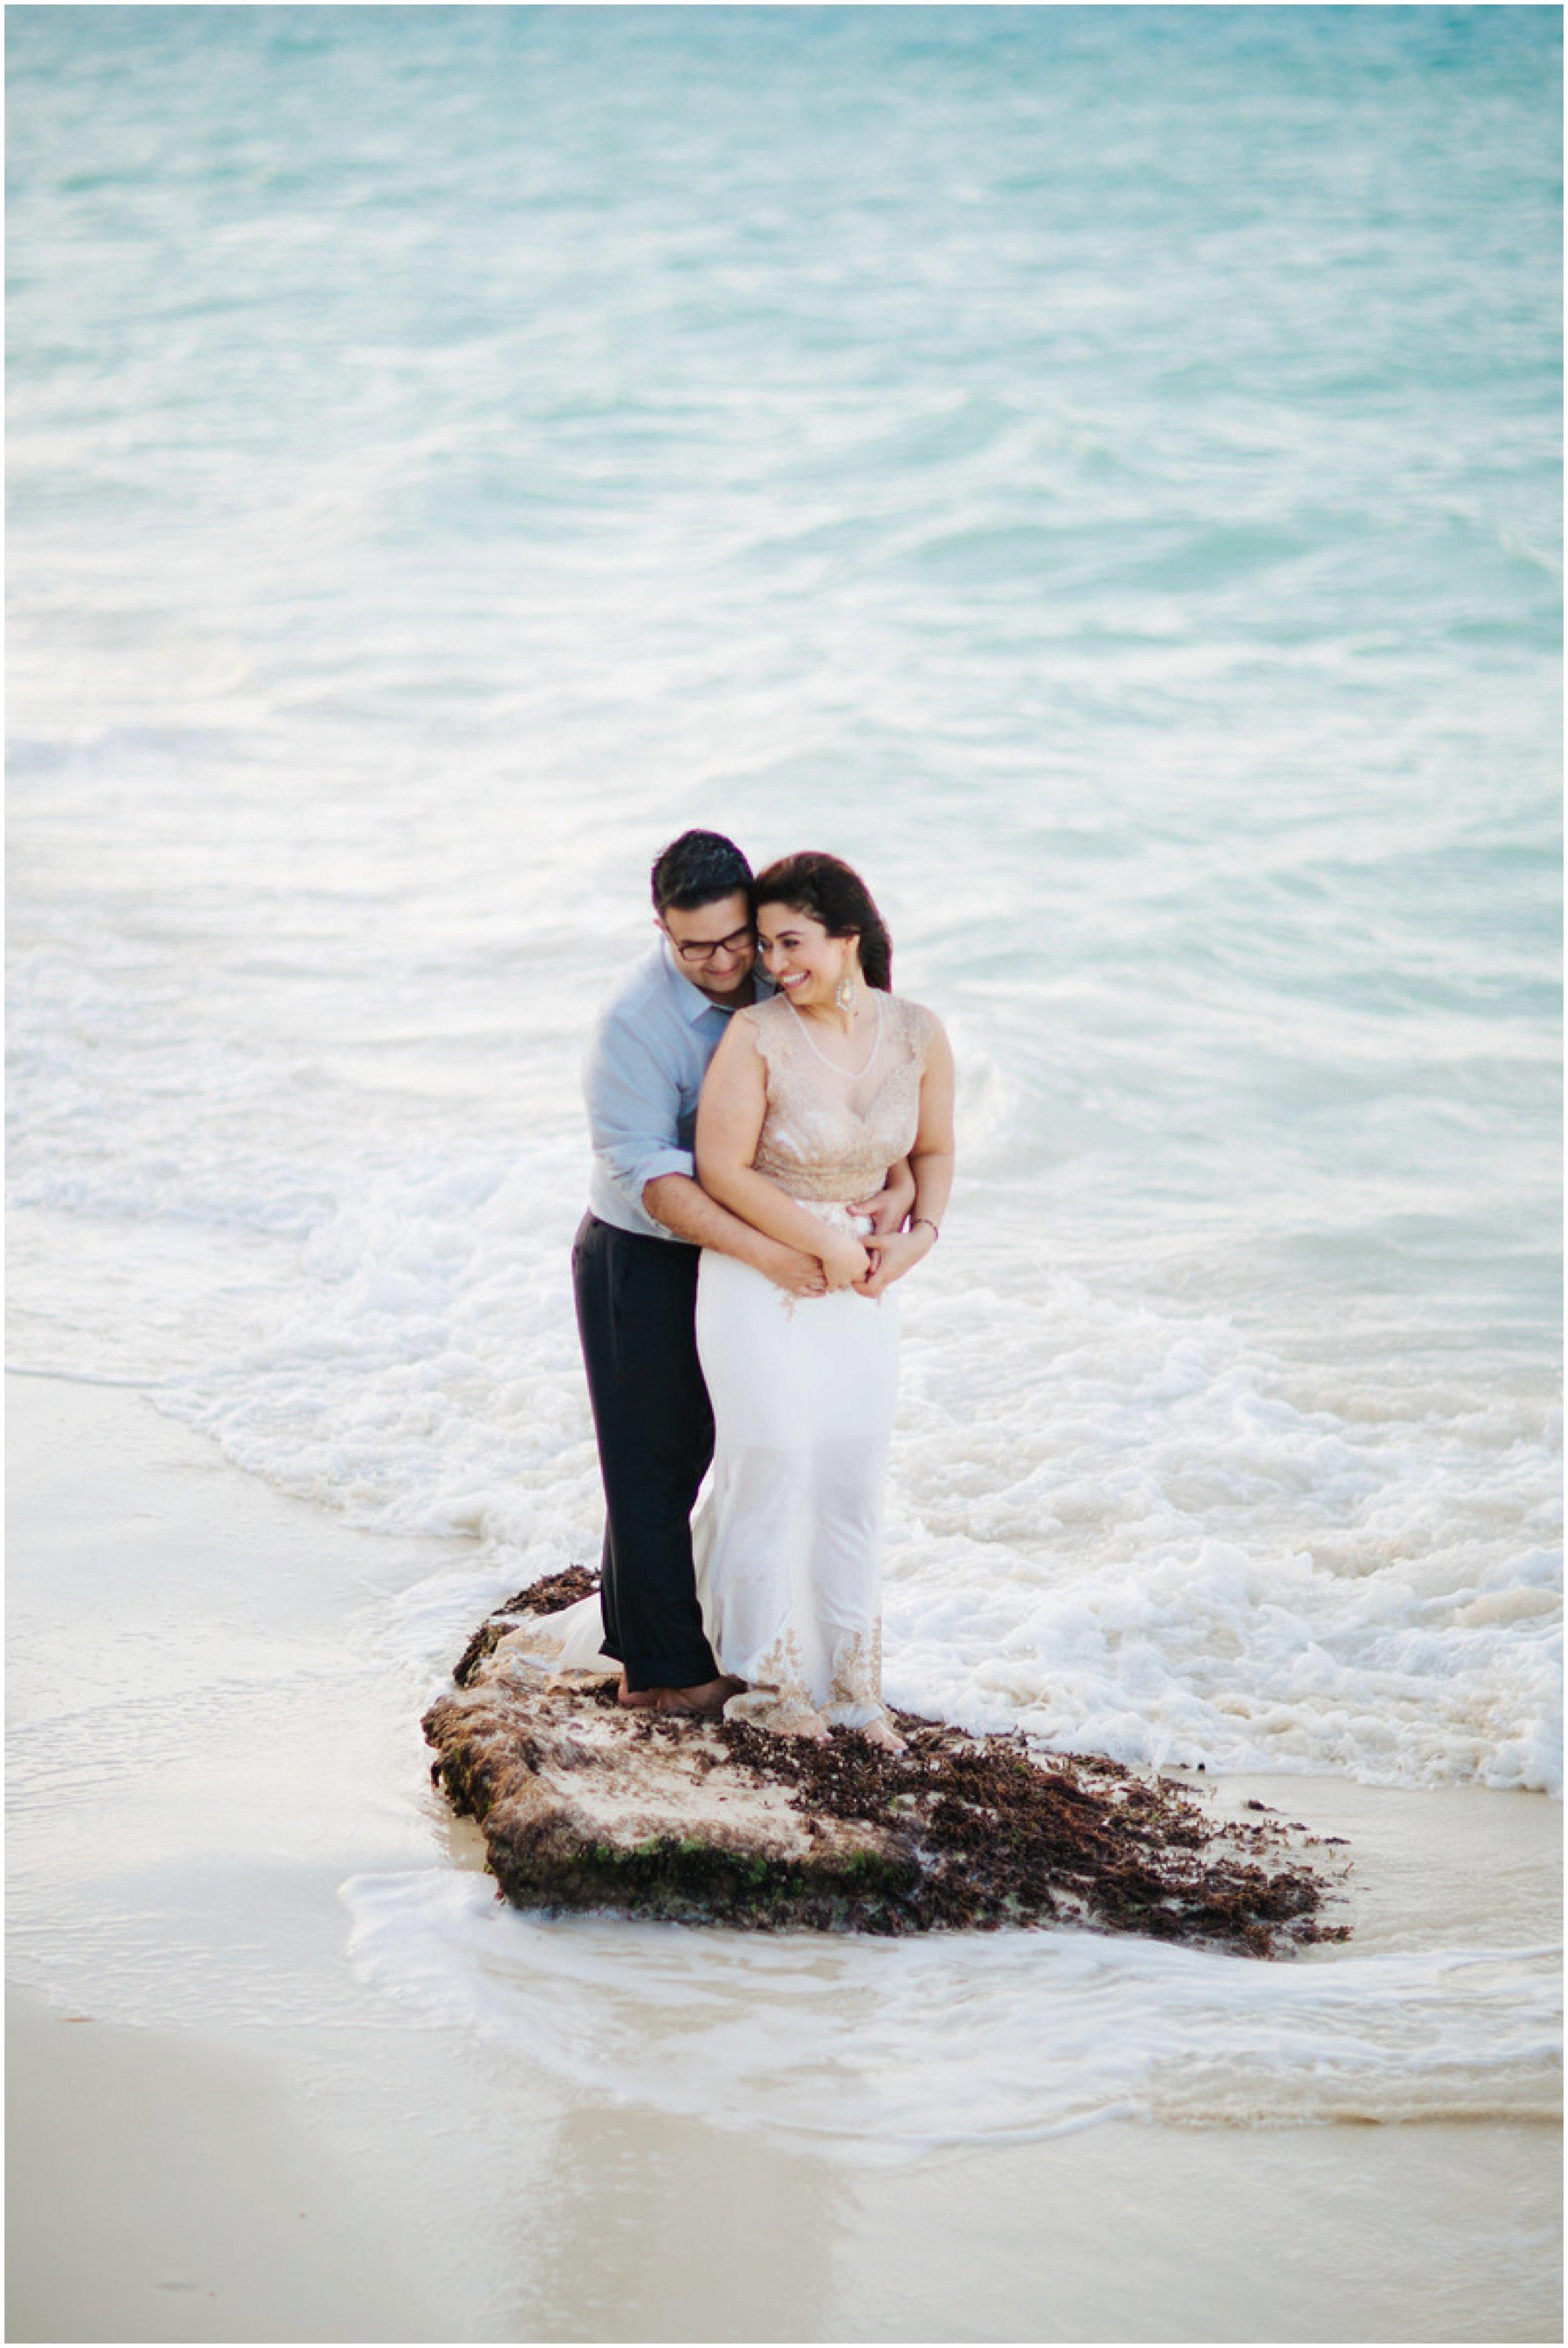 Le Cape Weddings- Destination Wedding Photography -ShayanandNikkie-41-X3_LuxuryDestinationPhotographer.jpg